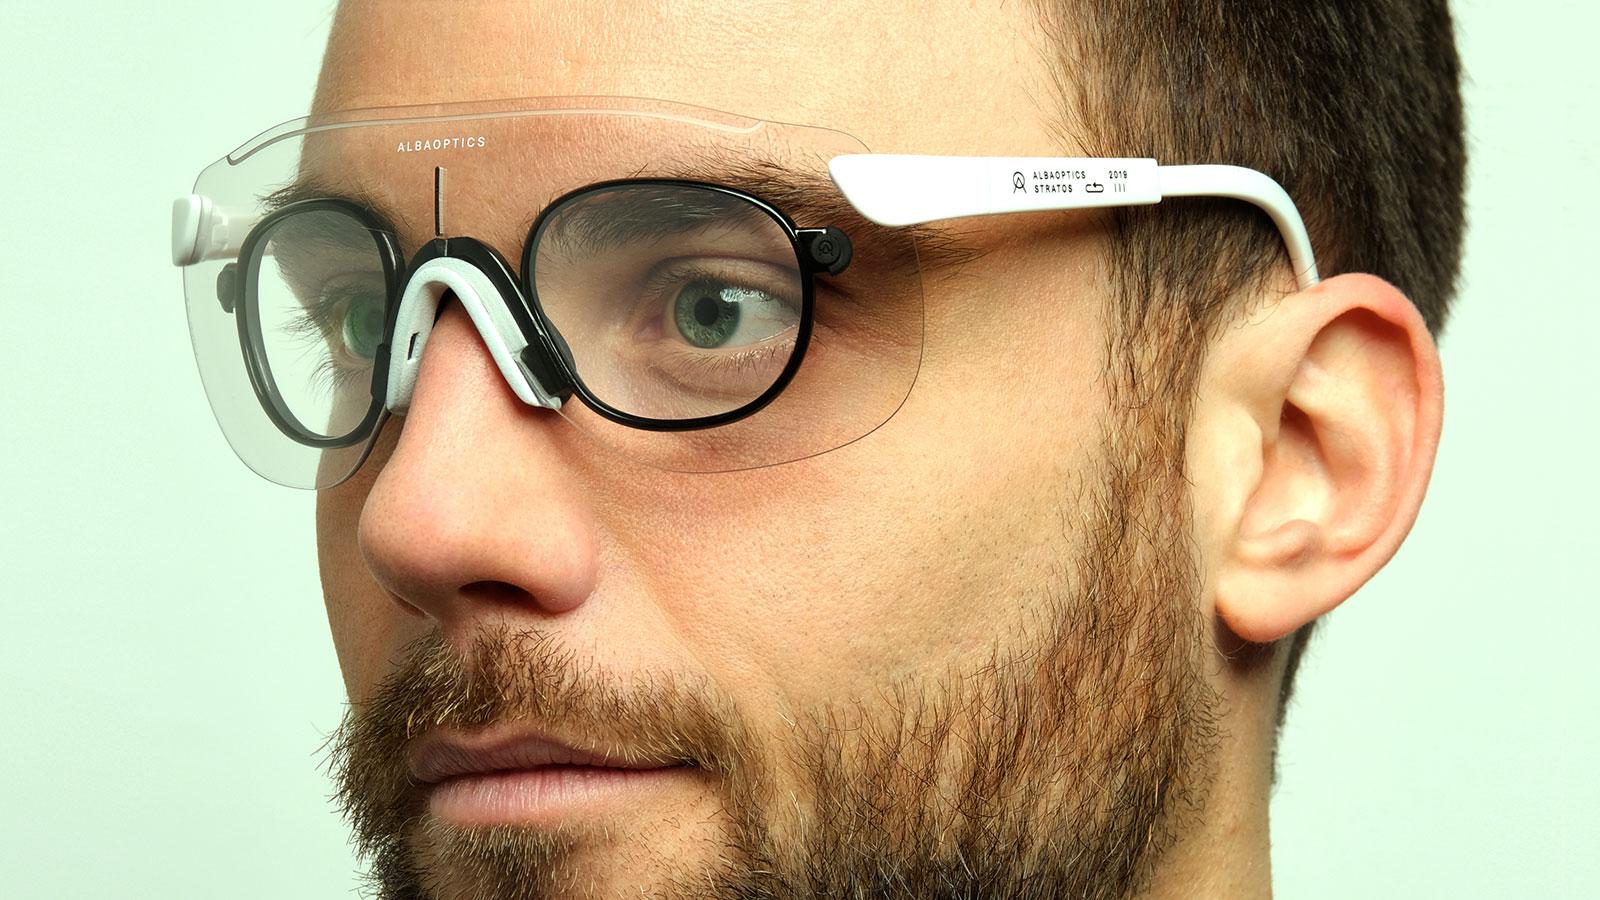 ALBA Optics Optical Clip